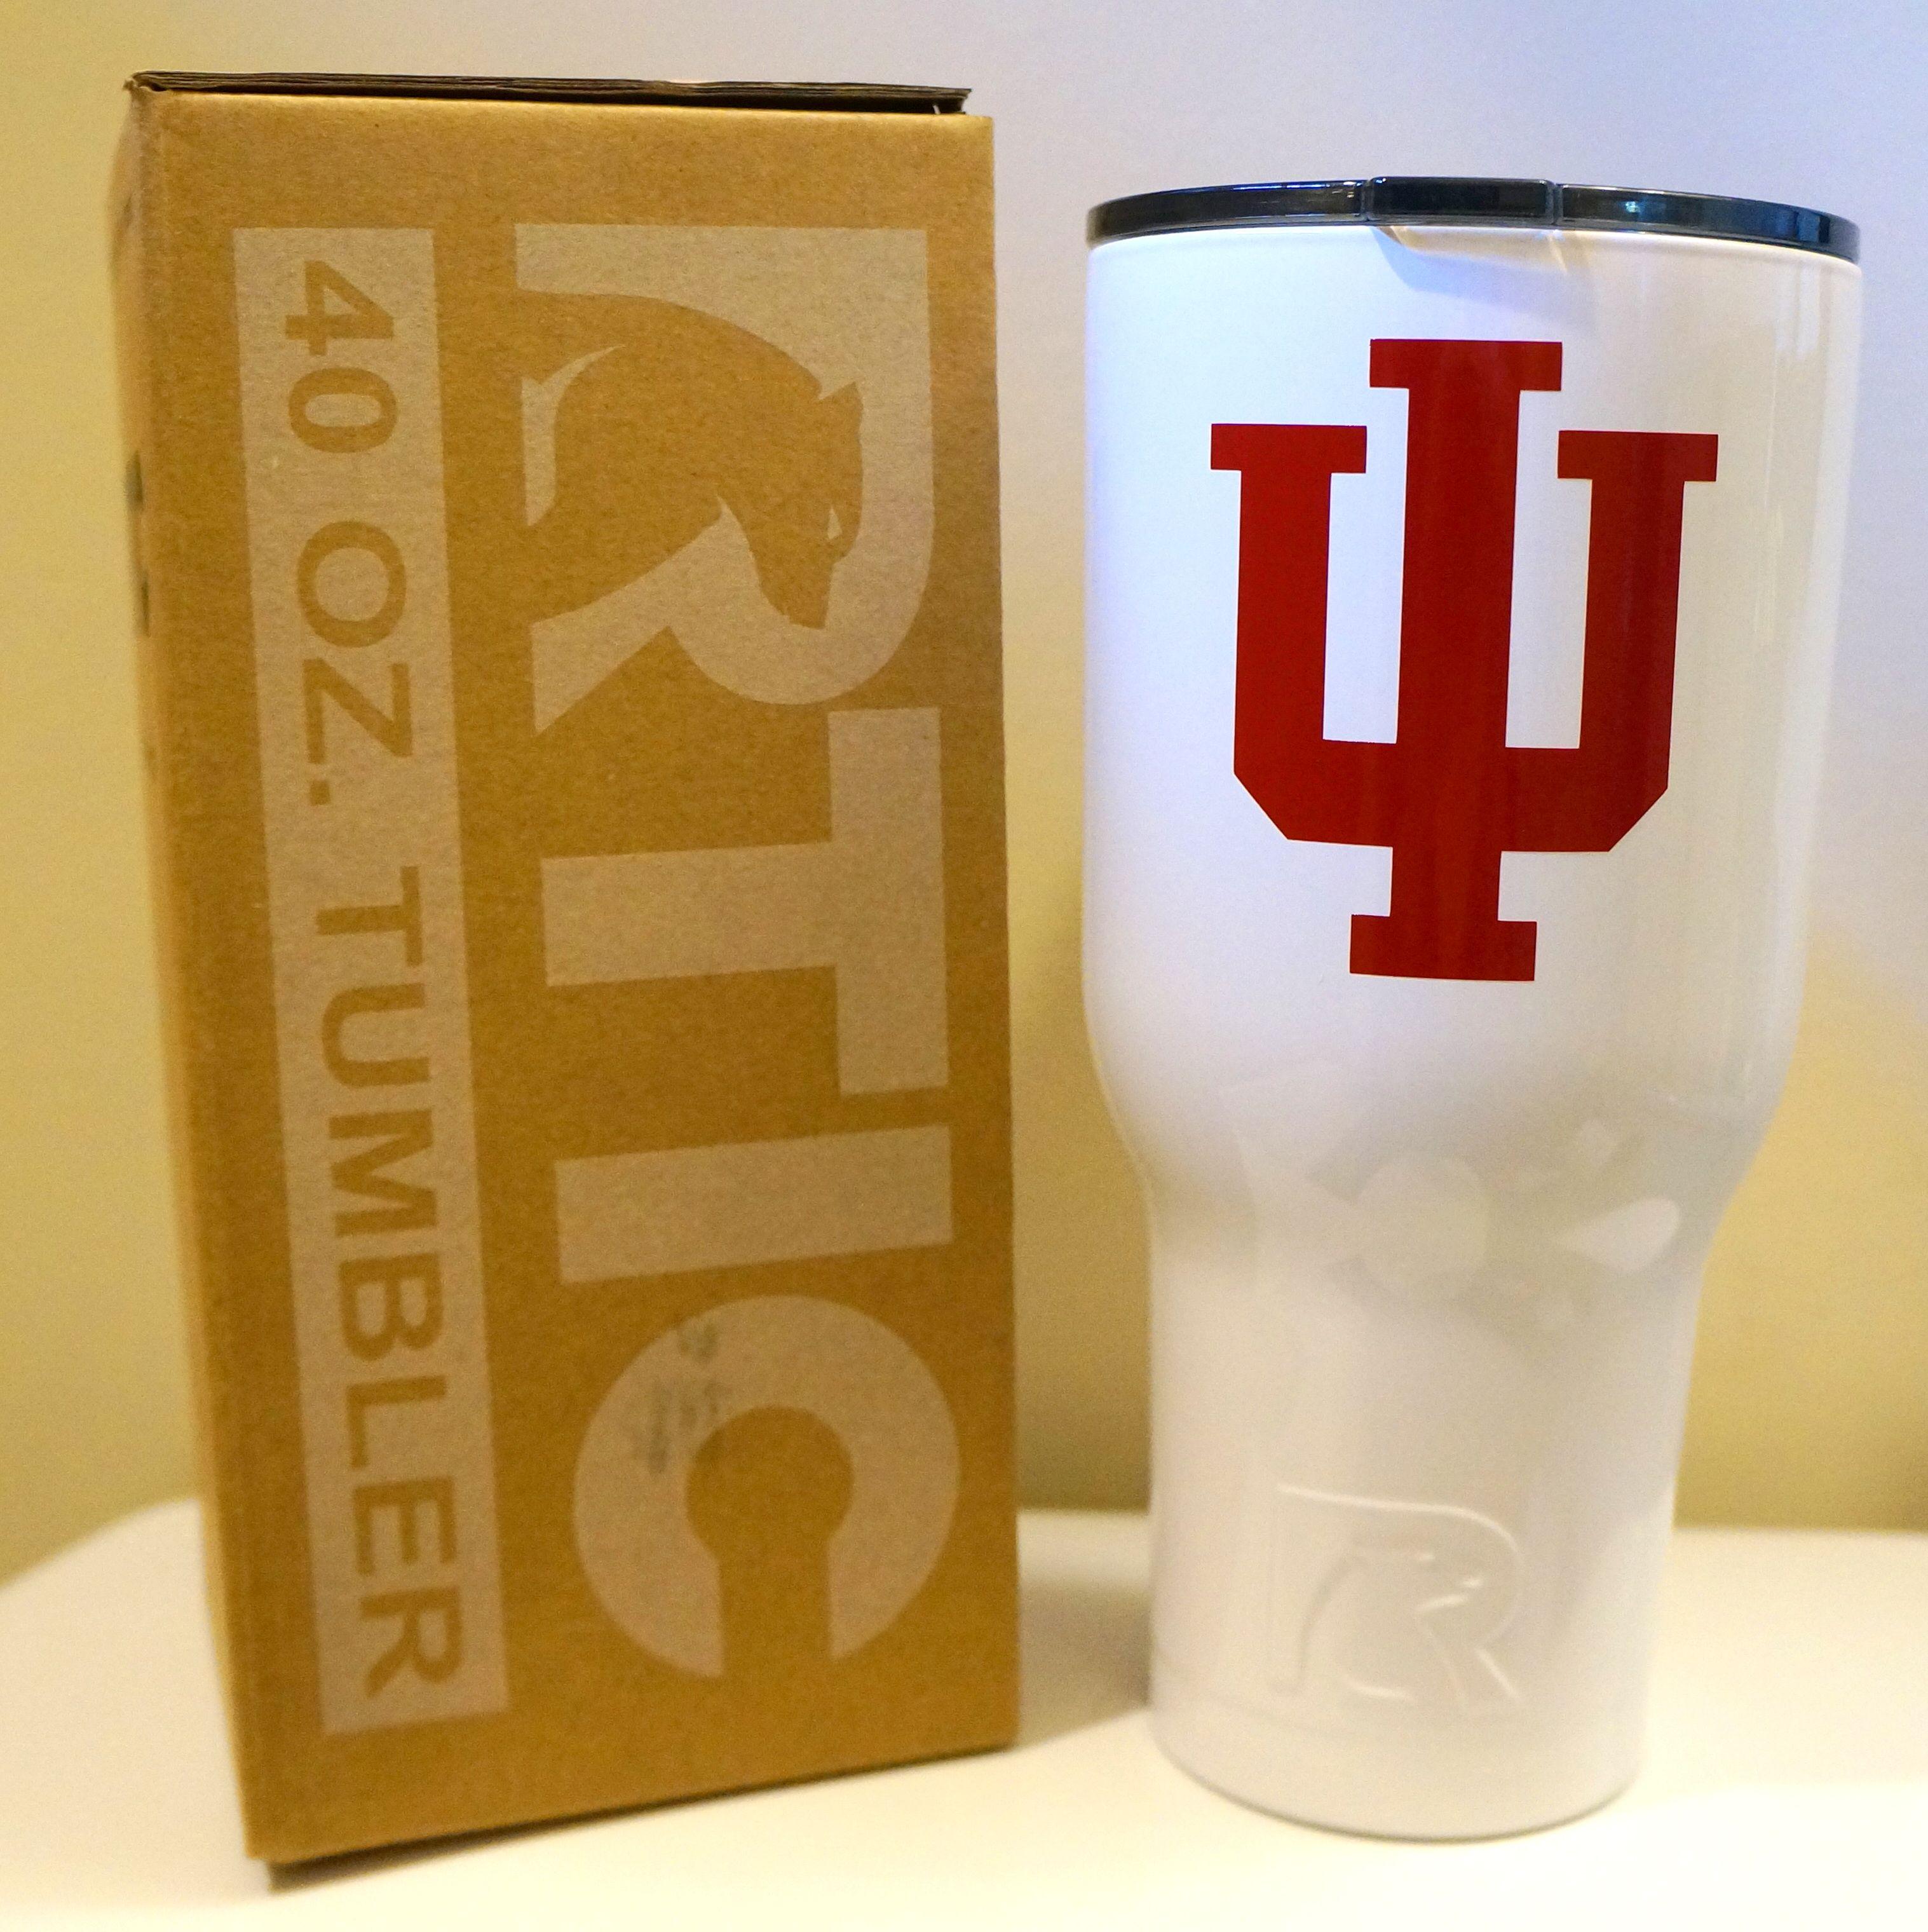 Indiana University Iu Inspired Rtic Tumbler 20 Oz 30 Oz 40 Oz Tumbler Rtic Tumblers Clear Epoxy